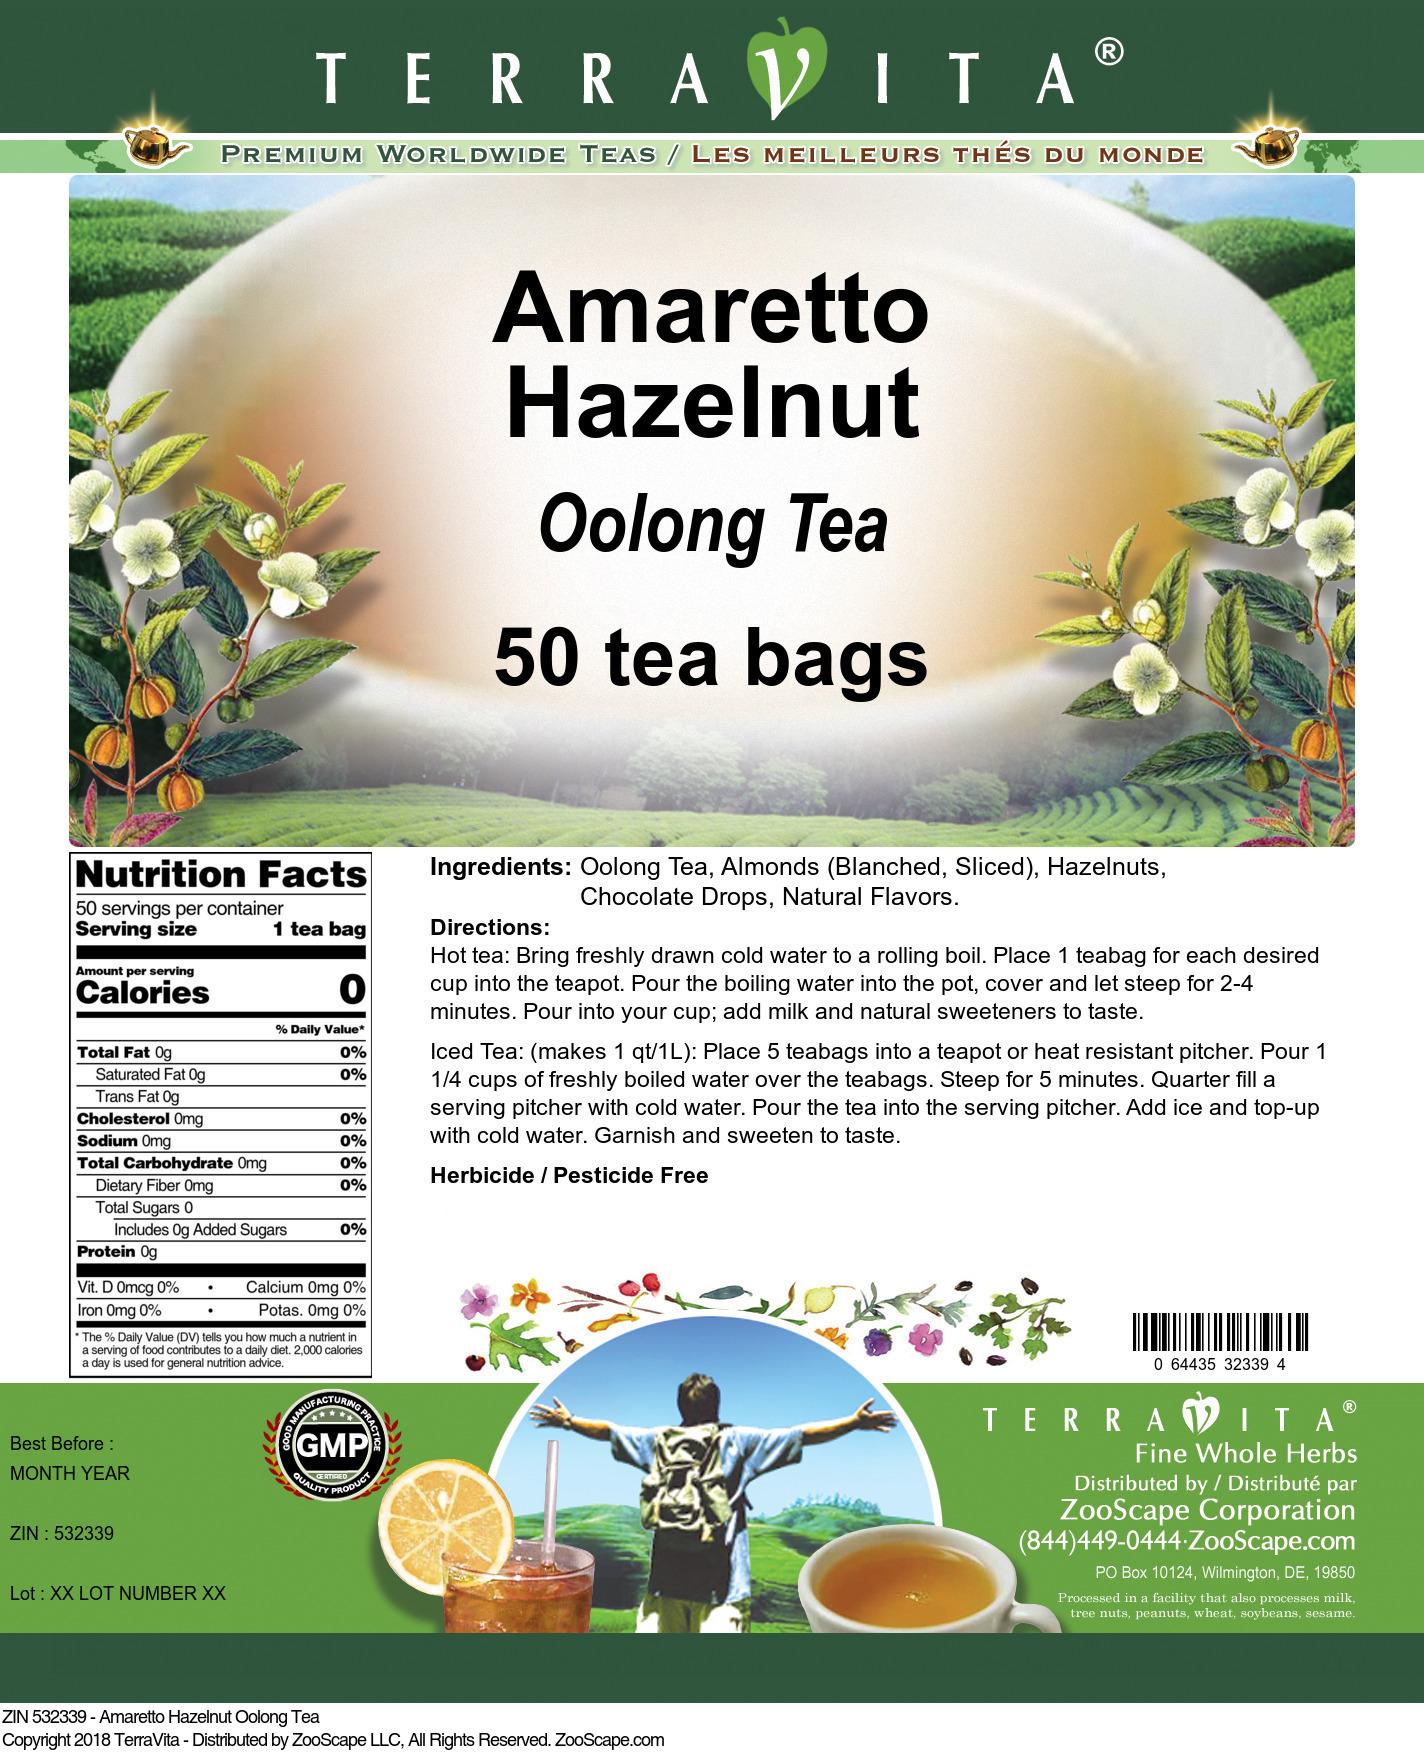 Amaretto Hazelnut Oolong Tea